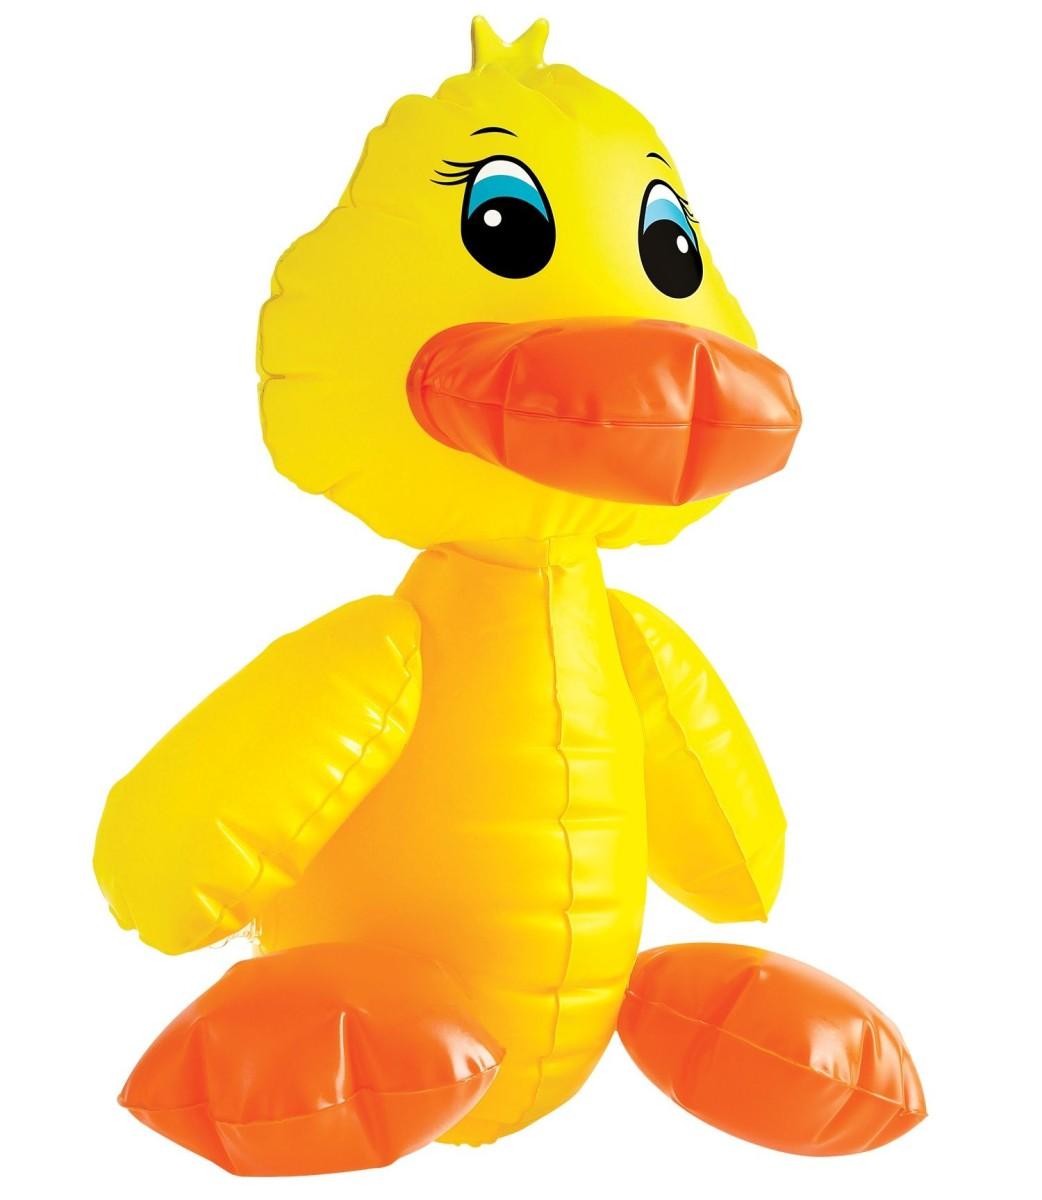 Pipedream F#CK-A-DUCK Yellow, žlutá masturbační kačenka